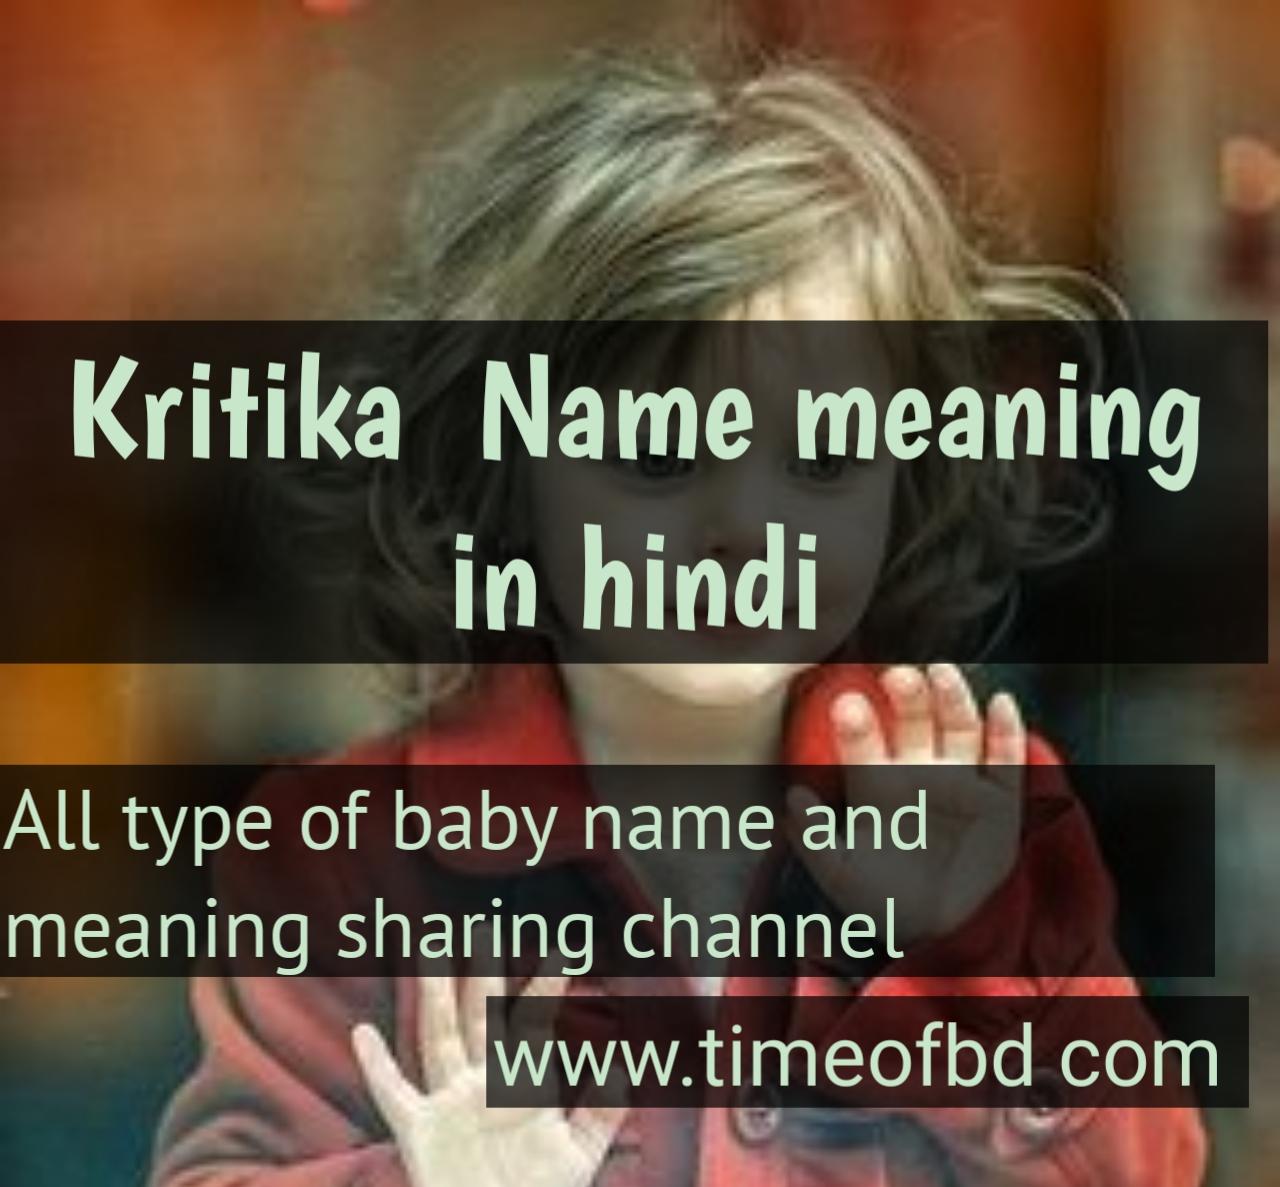 kritika name meaning in hindi, kritika ka meaning ,kritika meaning in hindi dictioanry,meaning of kritika  in hindi